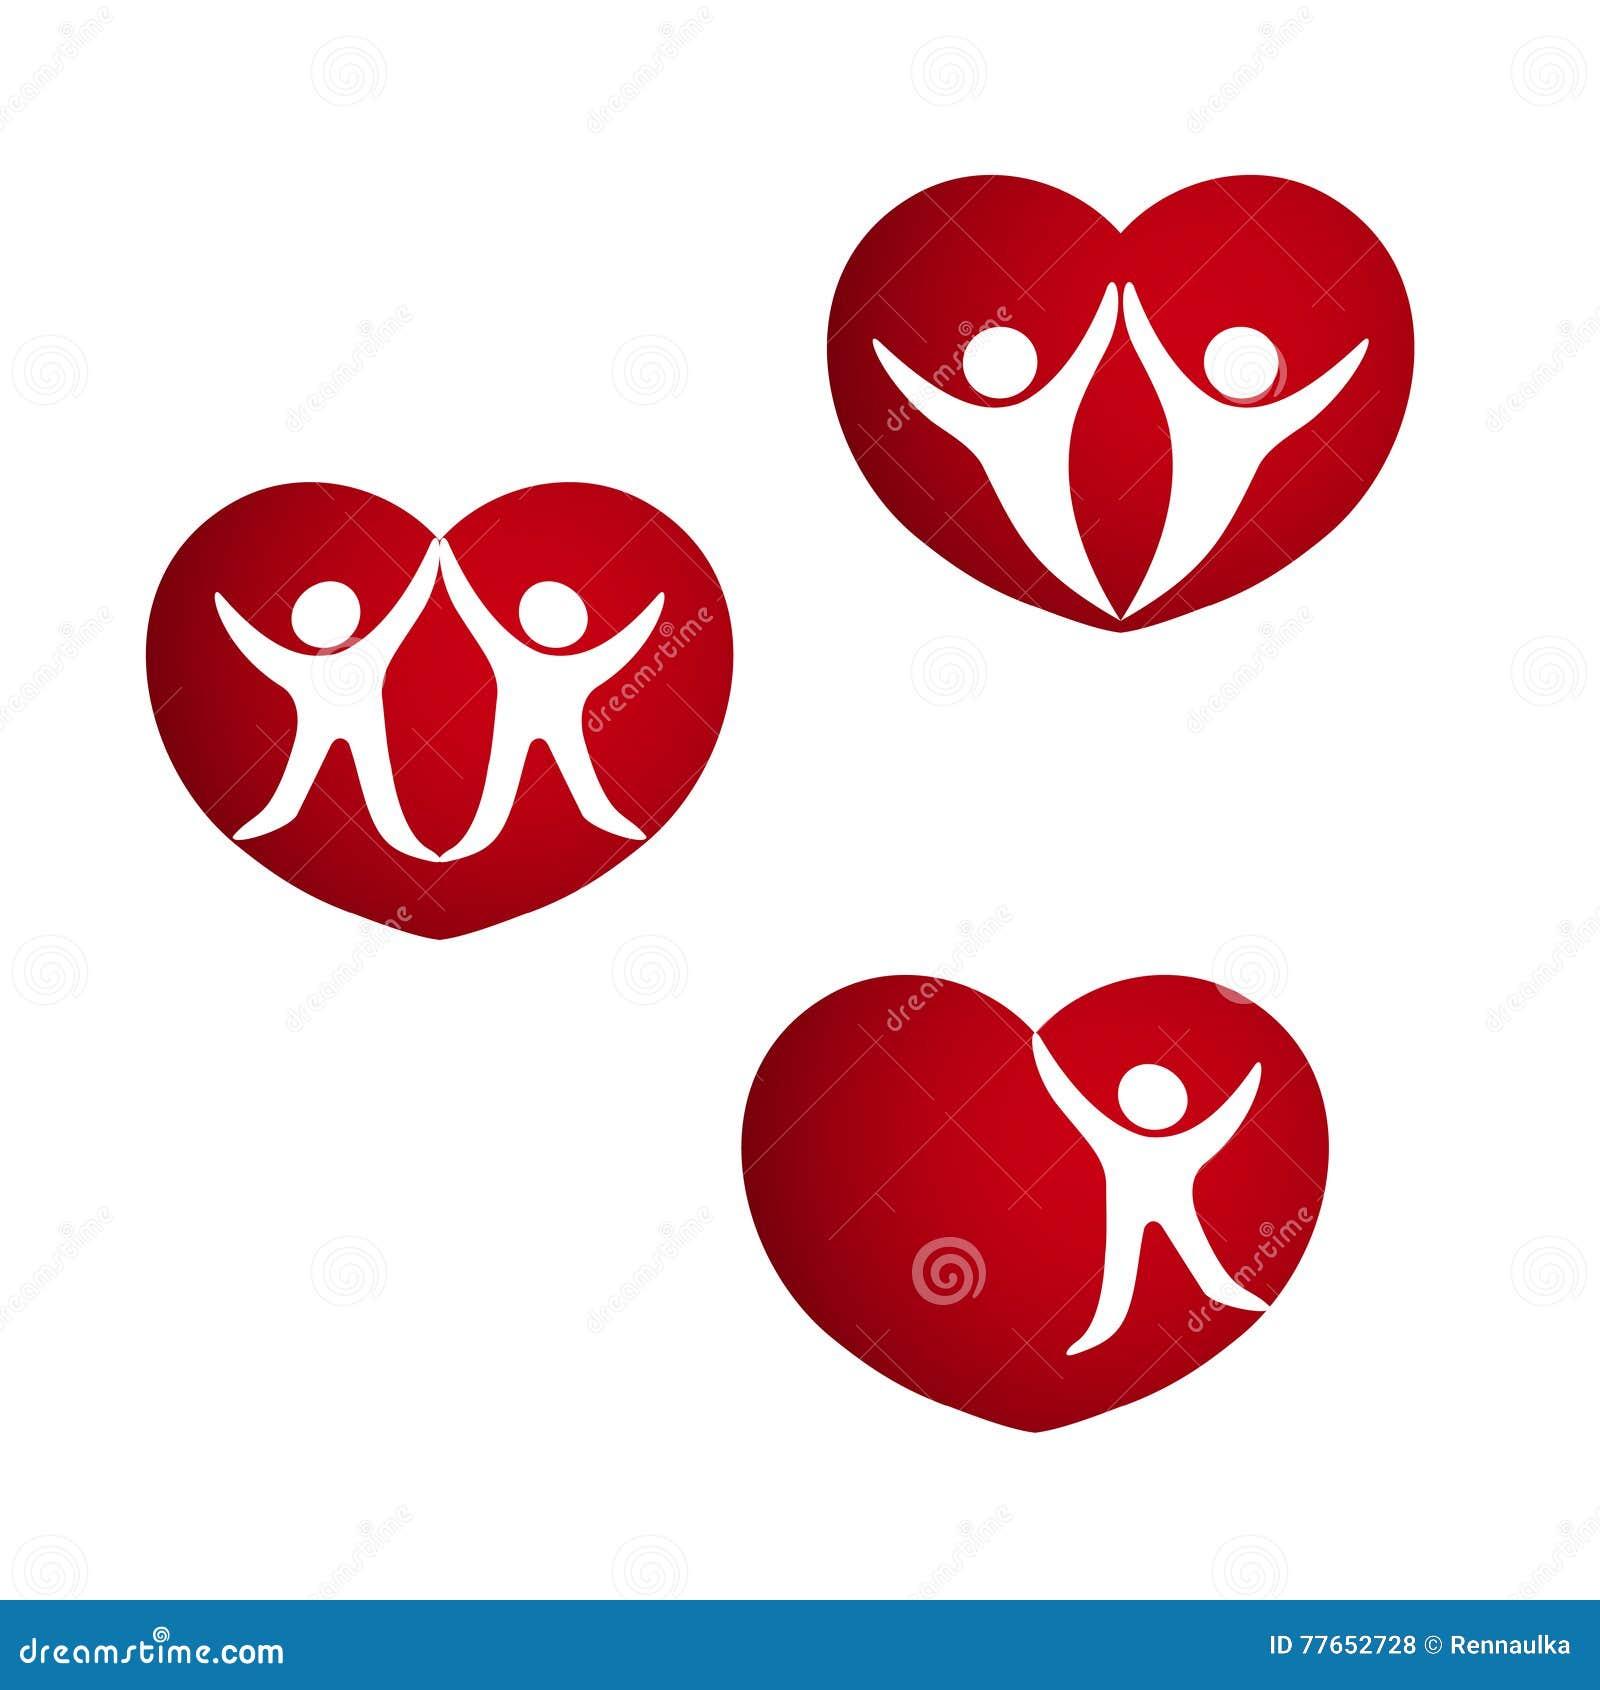 Set of red hearts symbols of life energy heart with silhouette set of red hearts symbols of life energy heart with silhouette of couple human symbol biocorpaavc